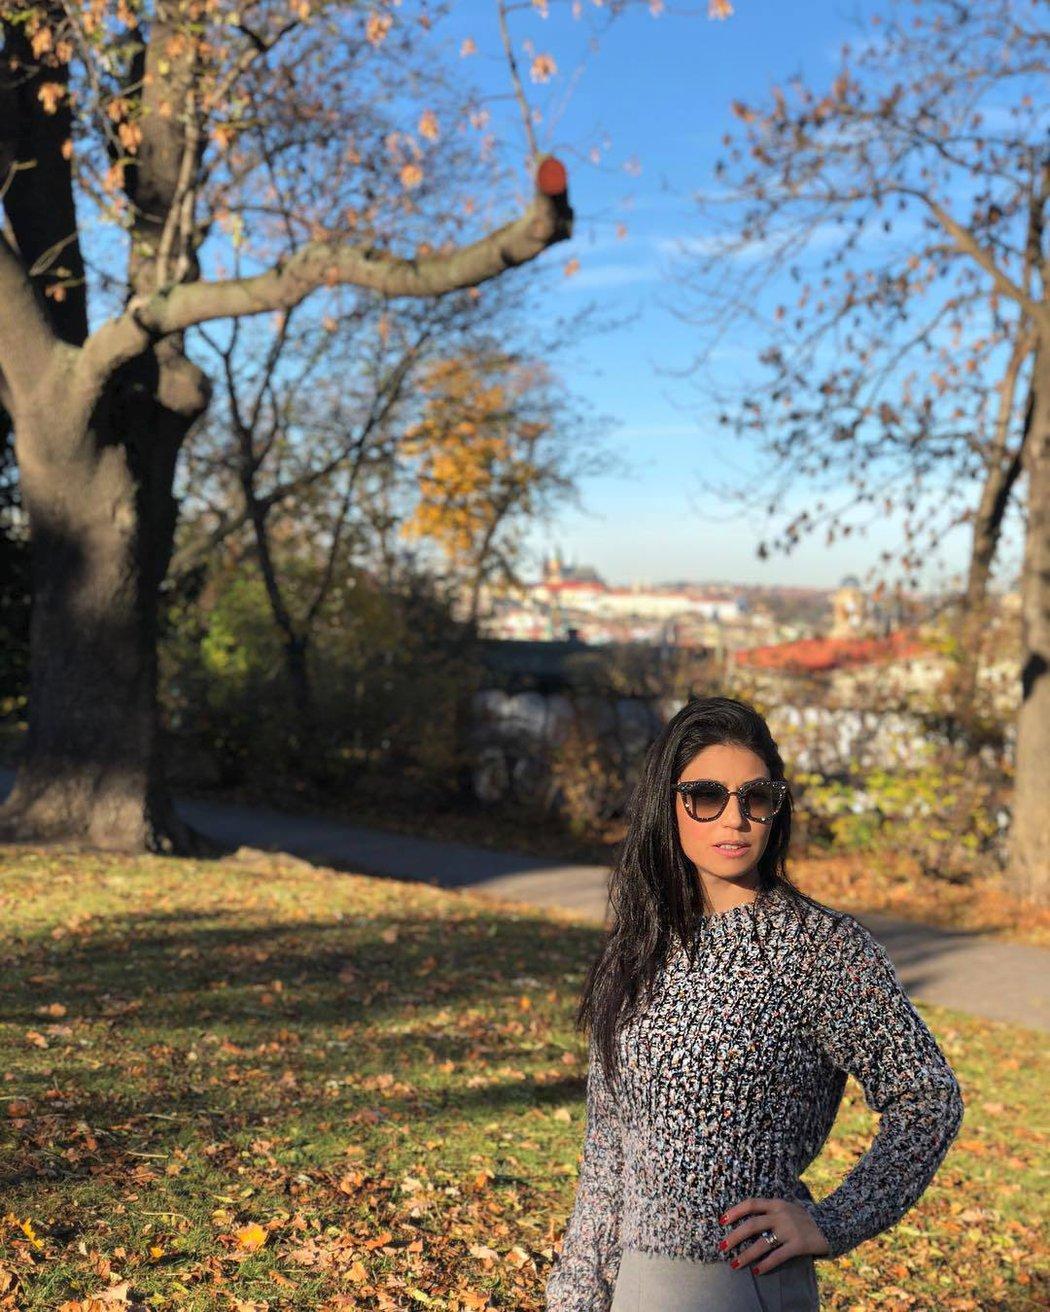 Stramaccioniho manželka Dalila si Prahu zamilovala